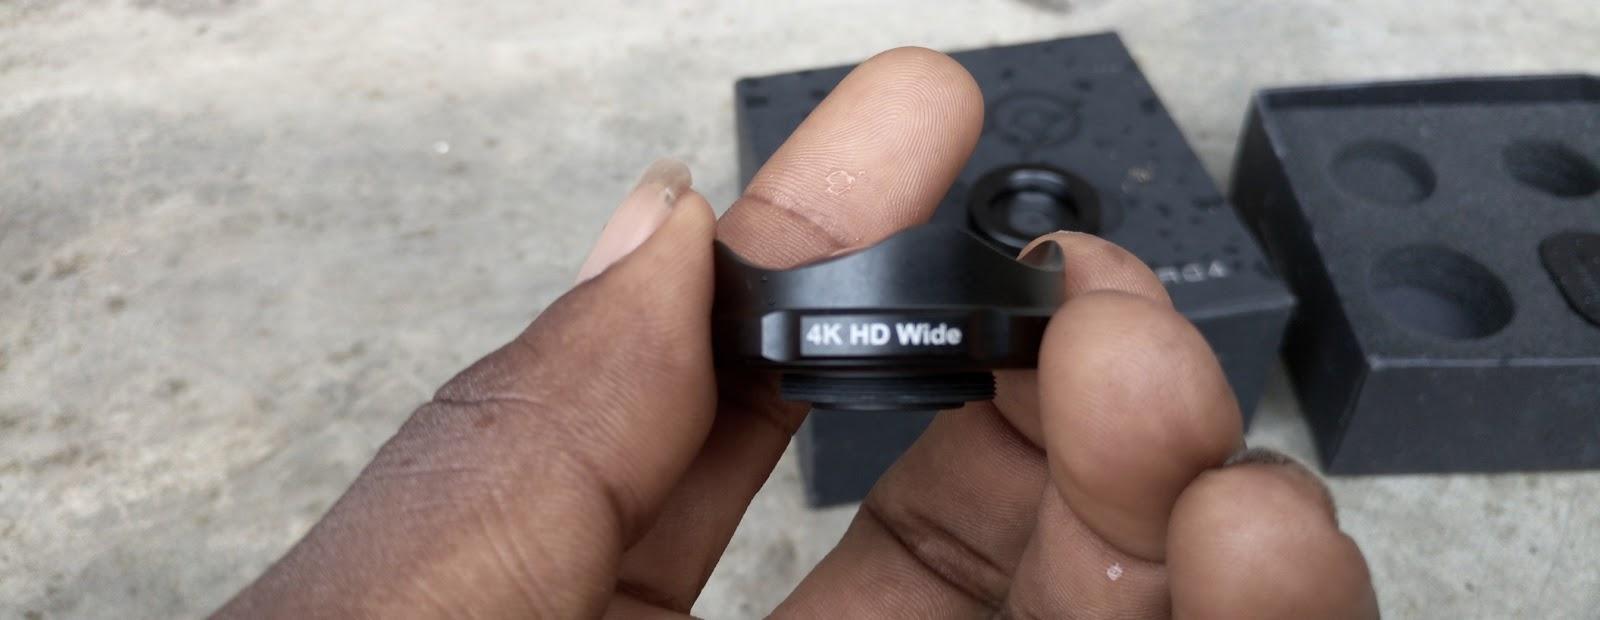 4K wide angle lens